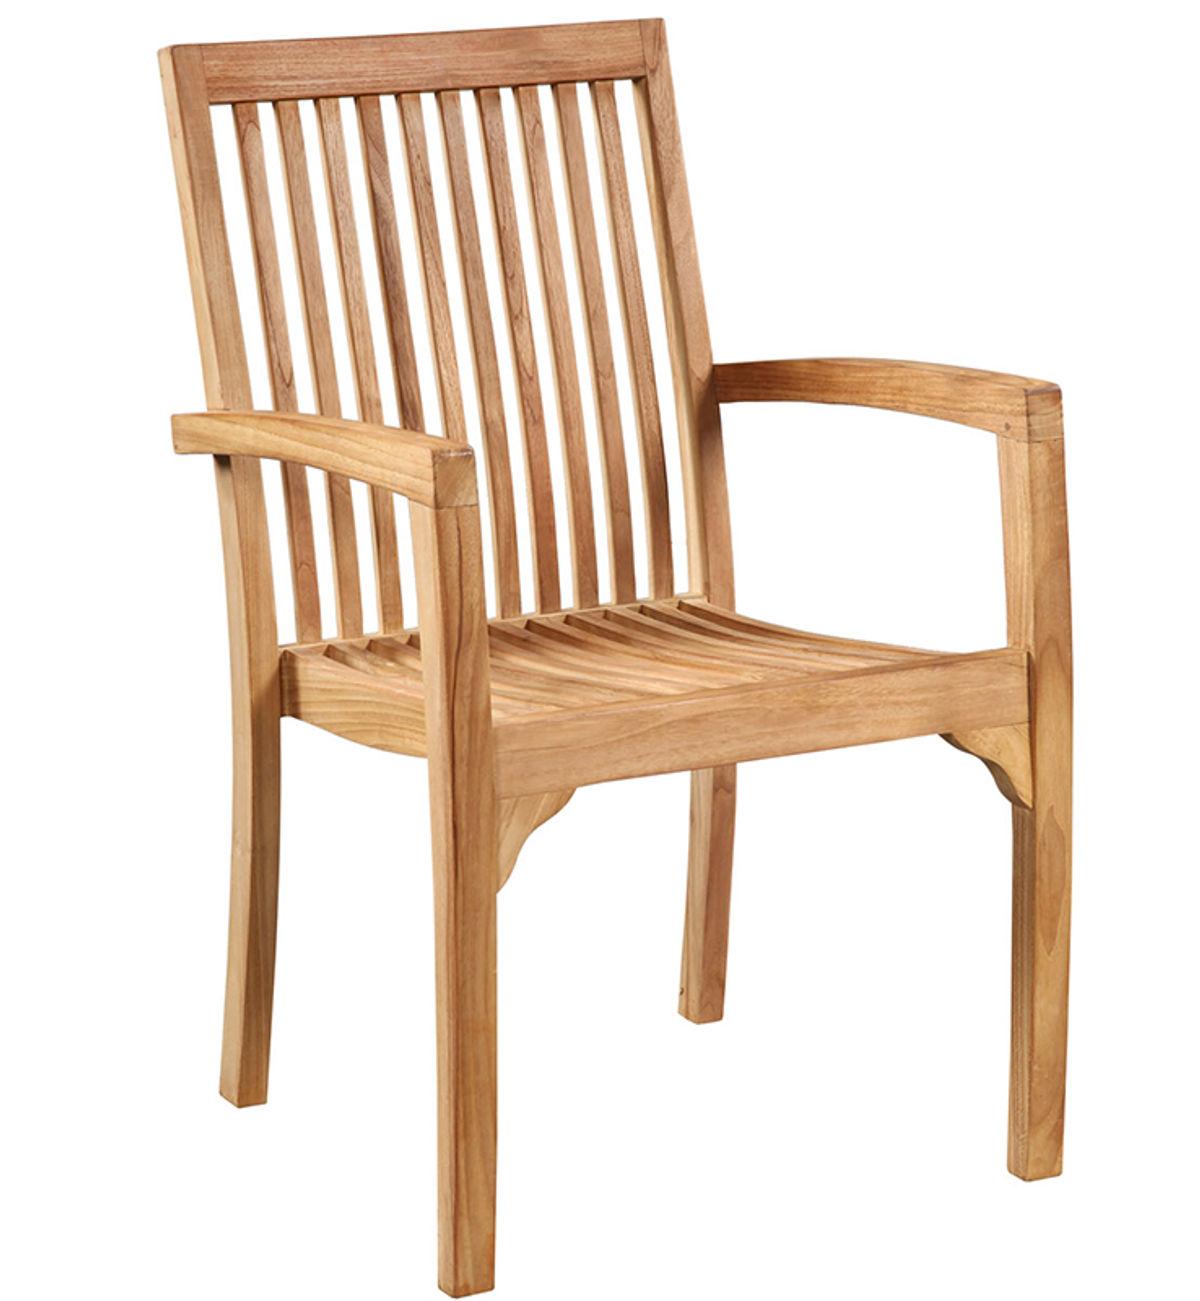 Teak Arm Chair - Outdoor